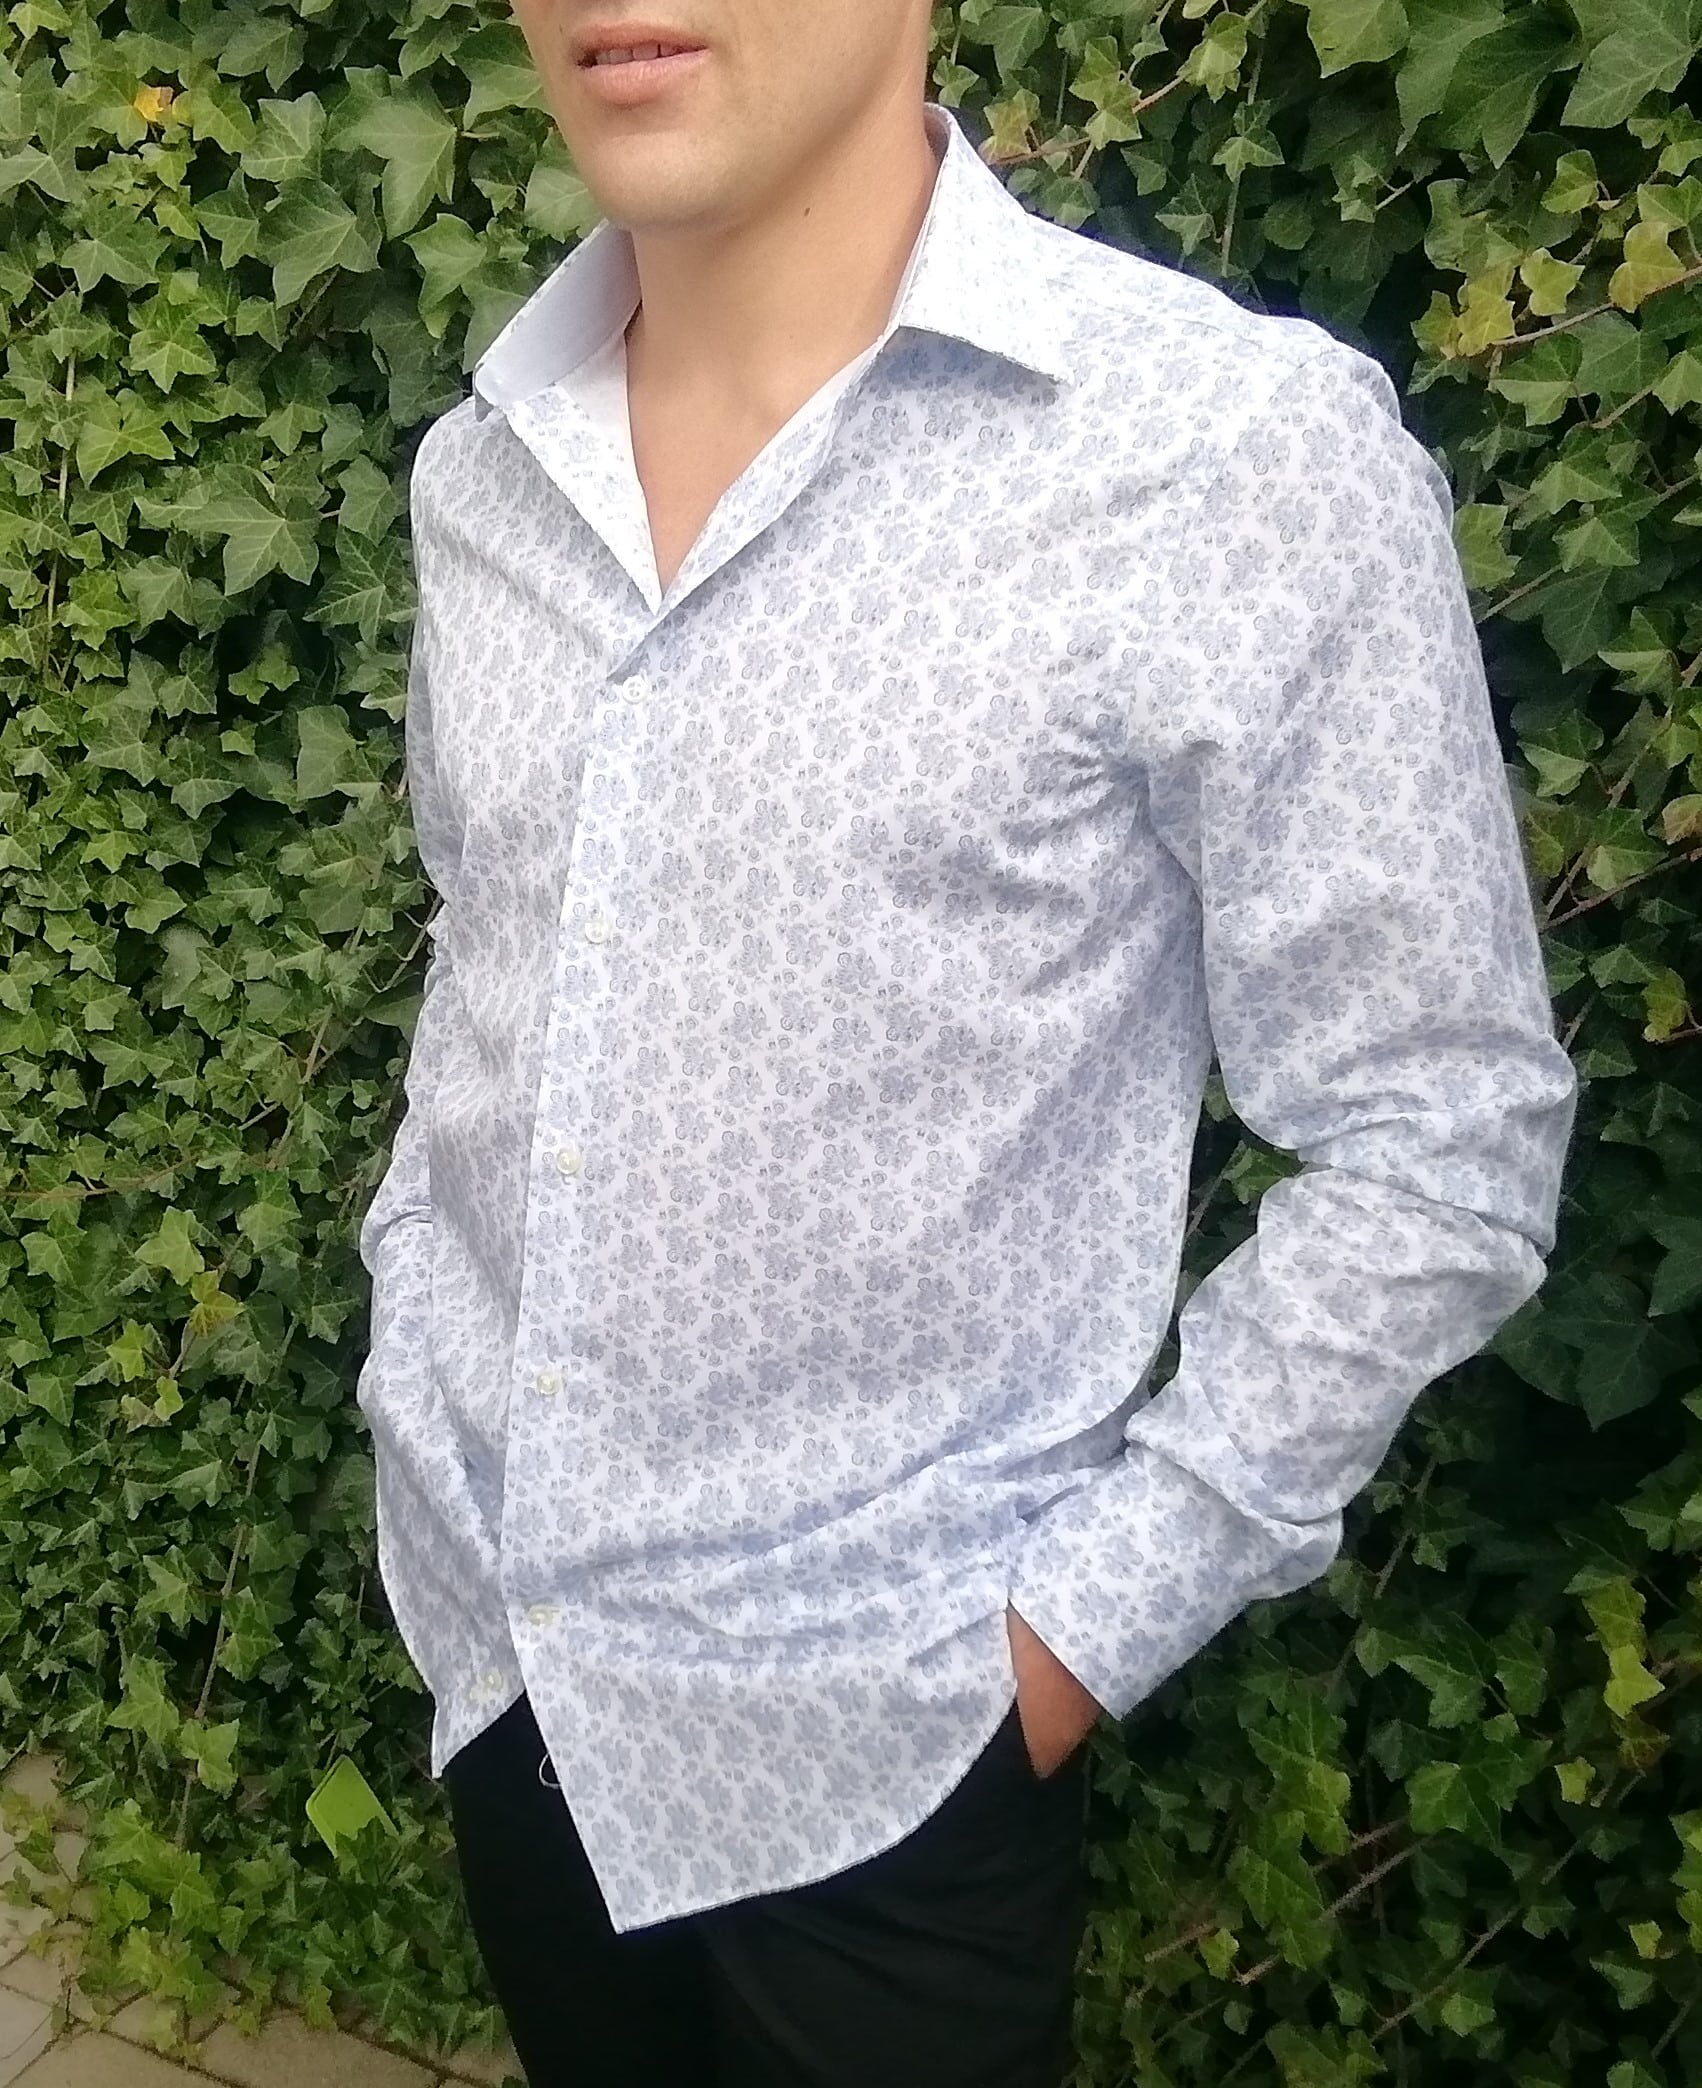 chianti chemise homme geneve lineatua